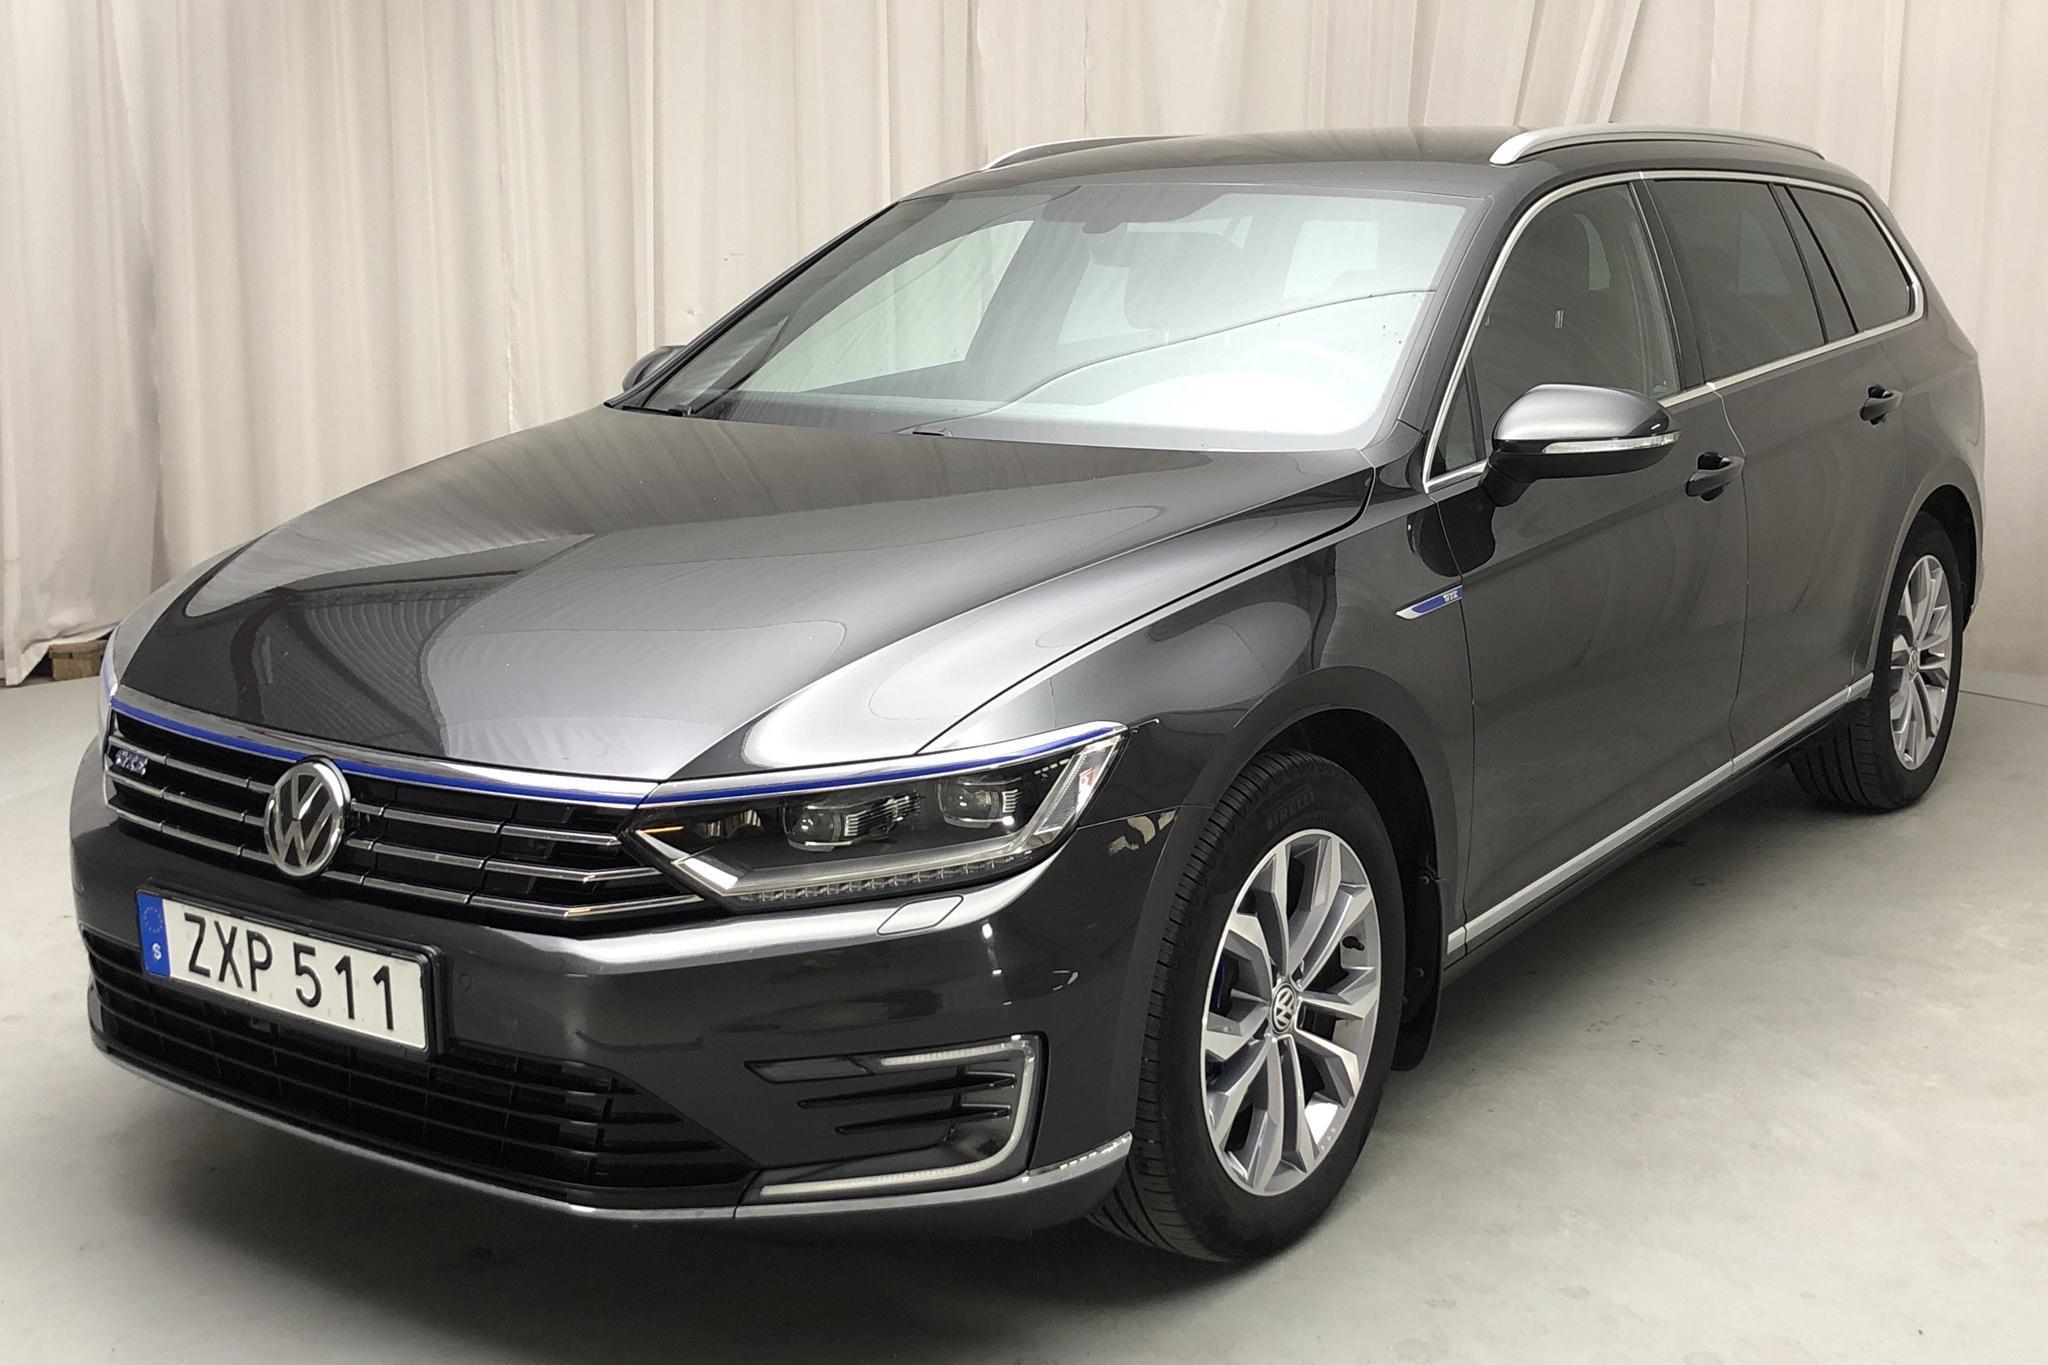 VW Passat 1.4 Plug-in-Hybrid Sportscombi (218hk) - 66 180 km - Automatic - Dark Grey - 2018